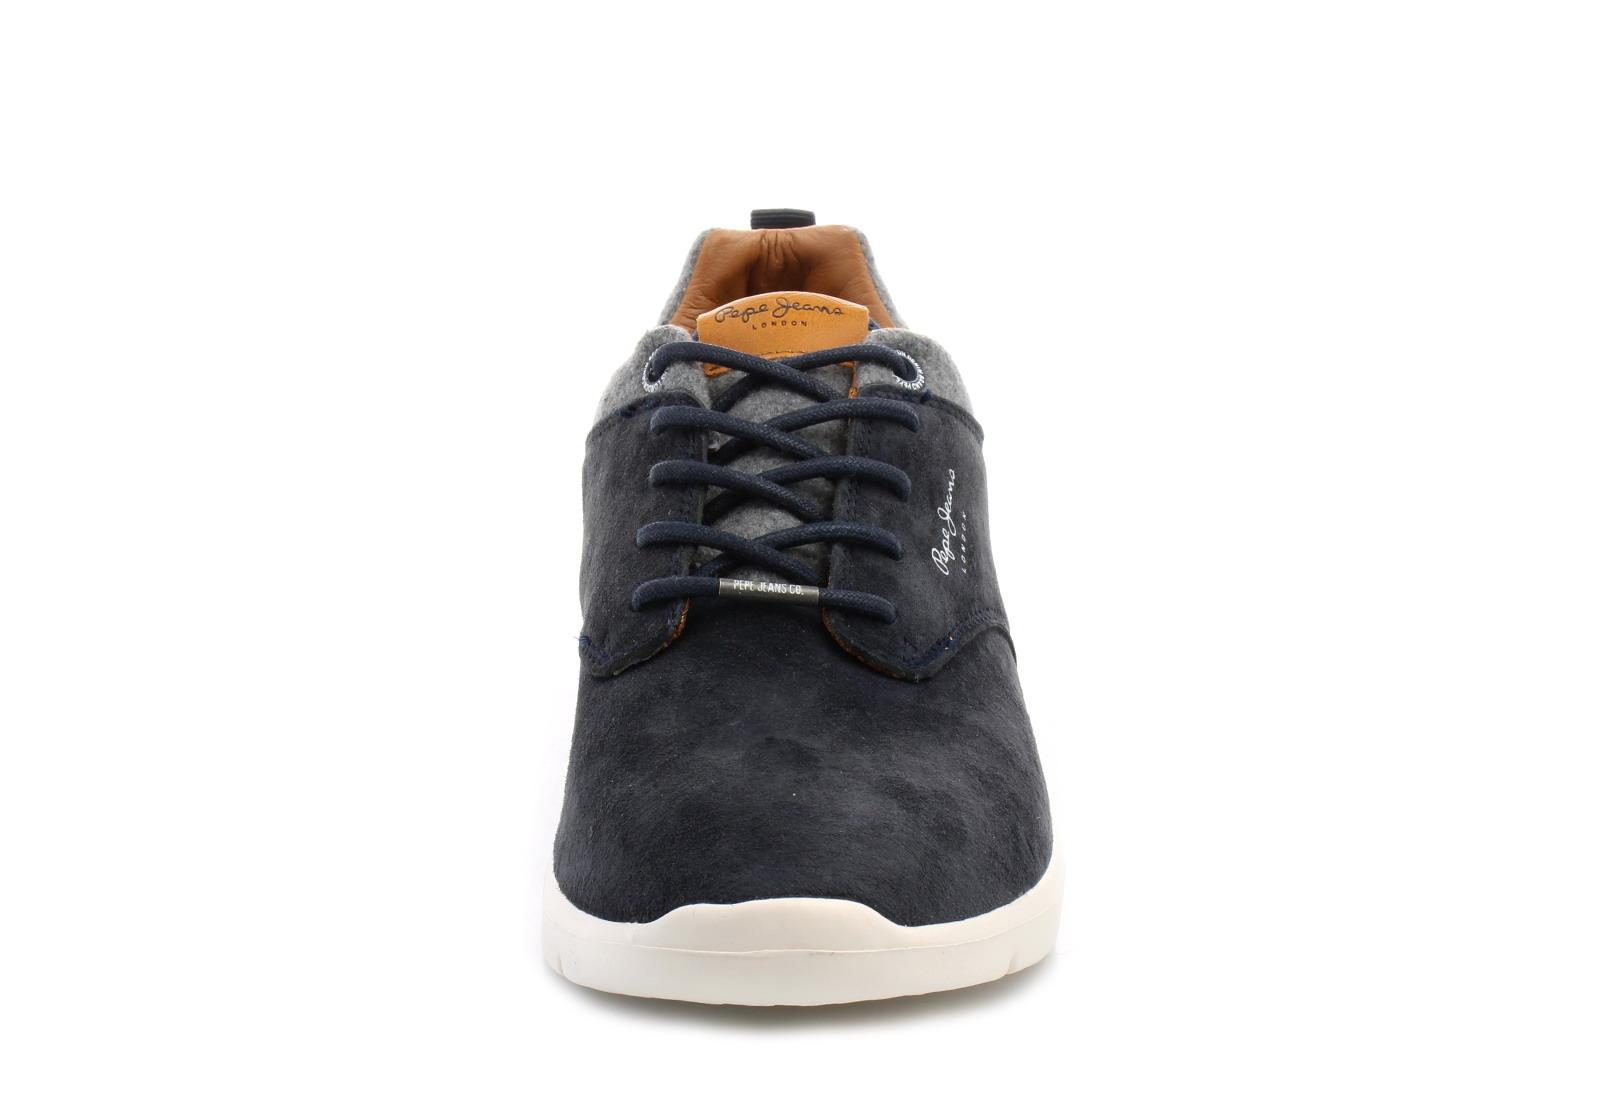 Pepe Jeans Shoes - Jayden - PMS30389585 - Online shop for sneakers ... 53e398d8f9